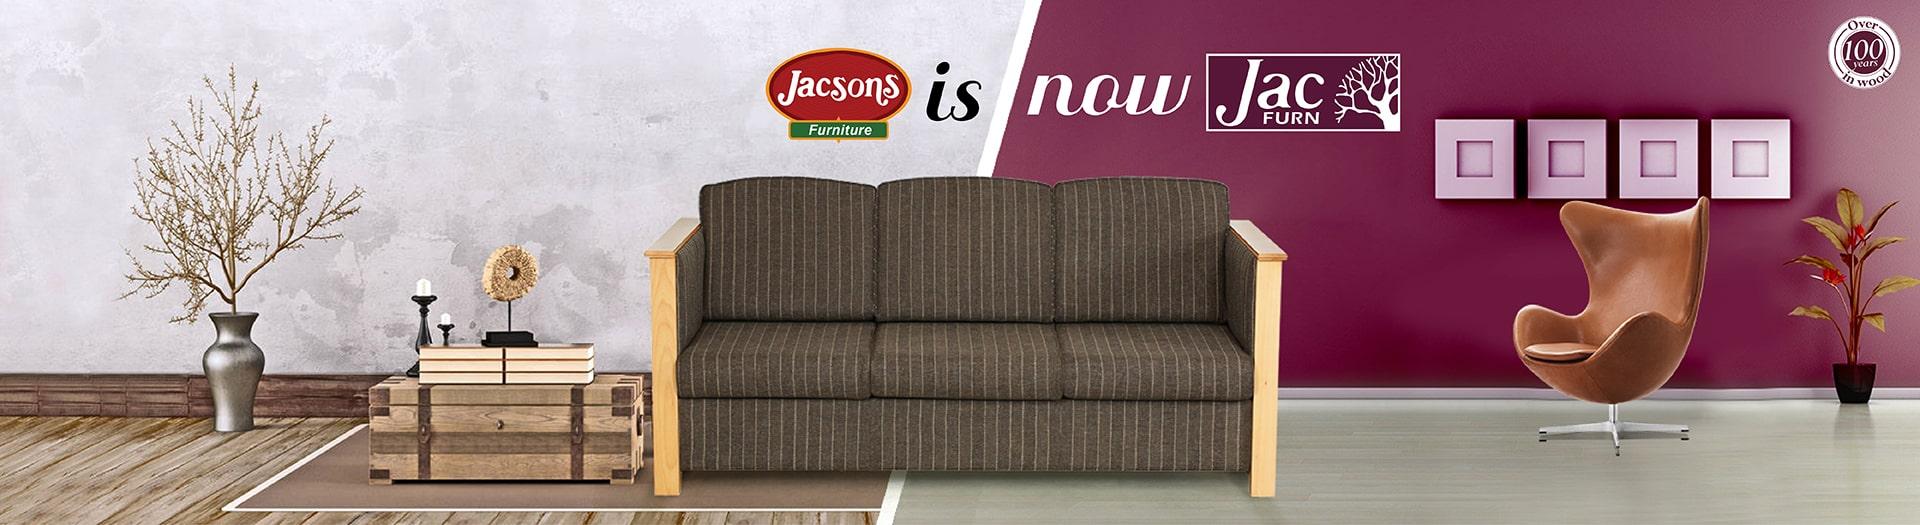 Stupendous Furniture Shops In Kerala Stores In Chennai Jacfurn Machost Co Dining Chair Design Ideas Machostcouk